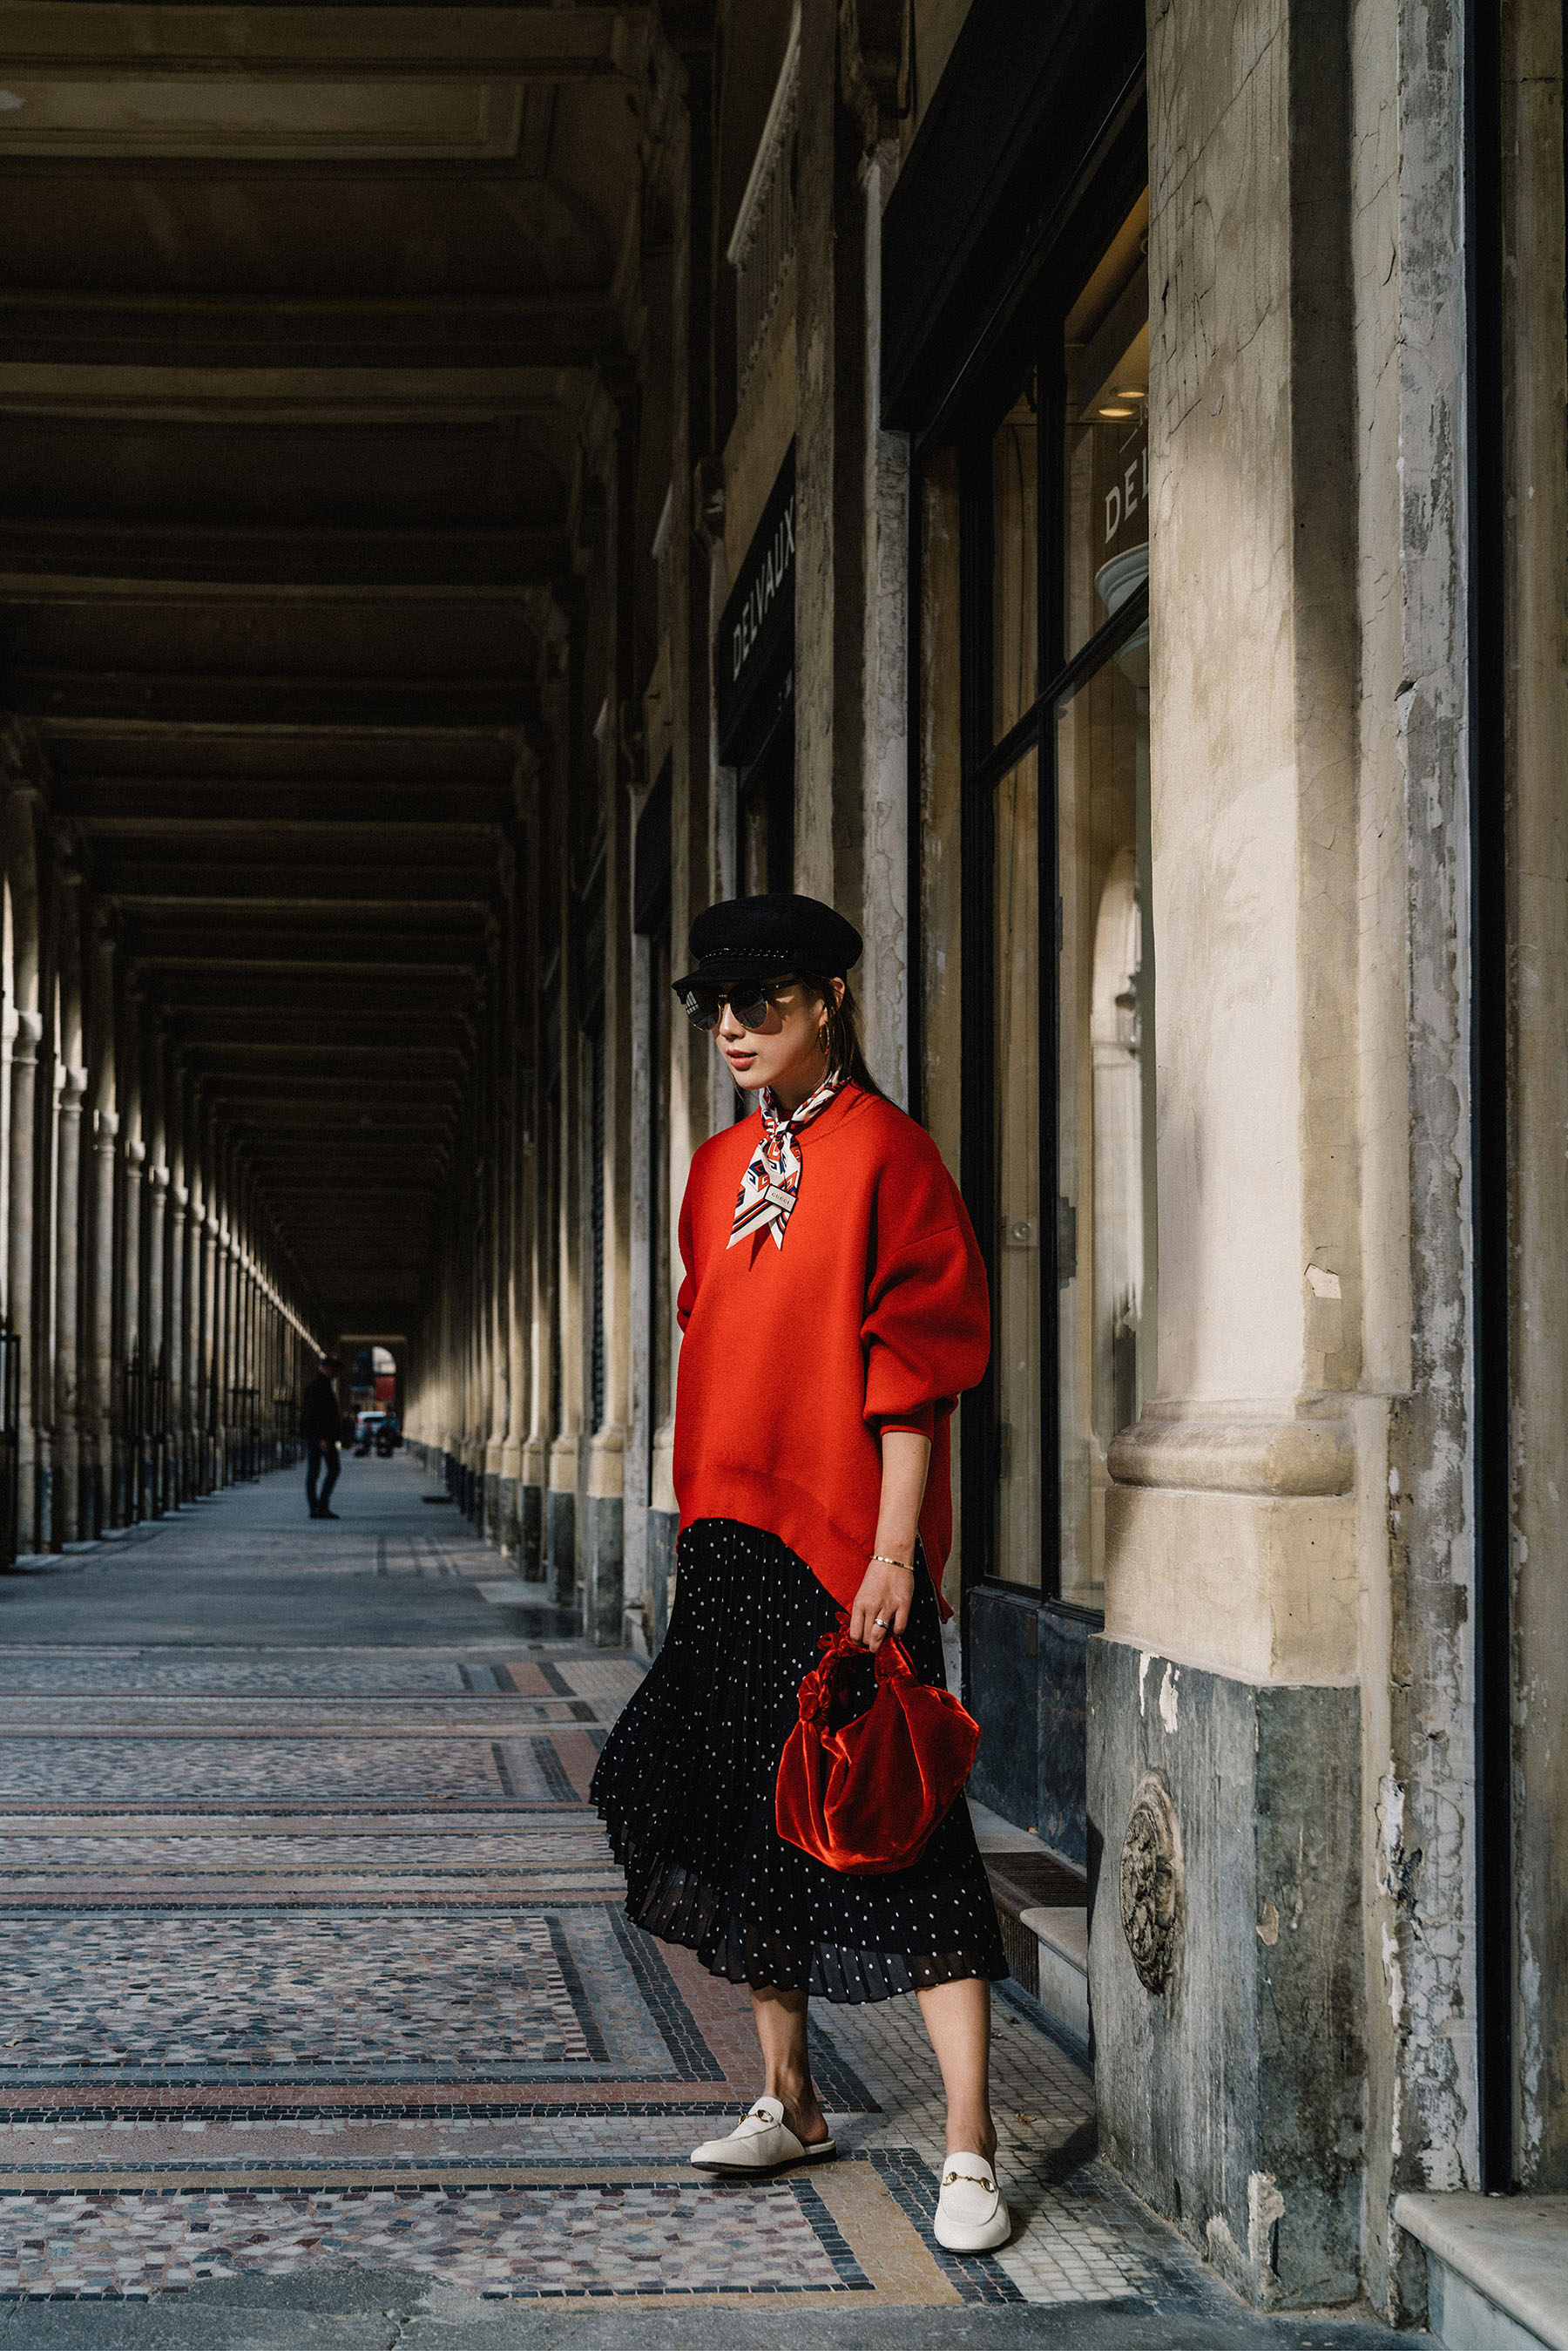 DKNY Pullover ,  Sezane Skirt ,  The Row Bag ,  Gucci Scarf , Eugenia Kim Hat,  Gentle Monster Sunnies ,  Vita Fede Earrings